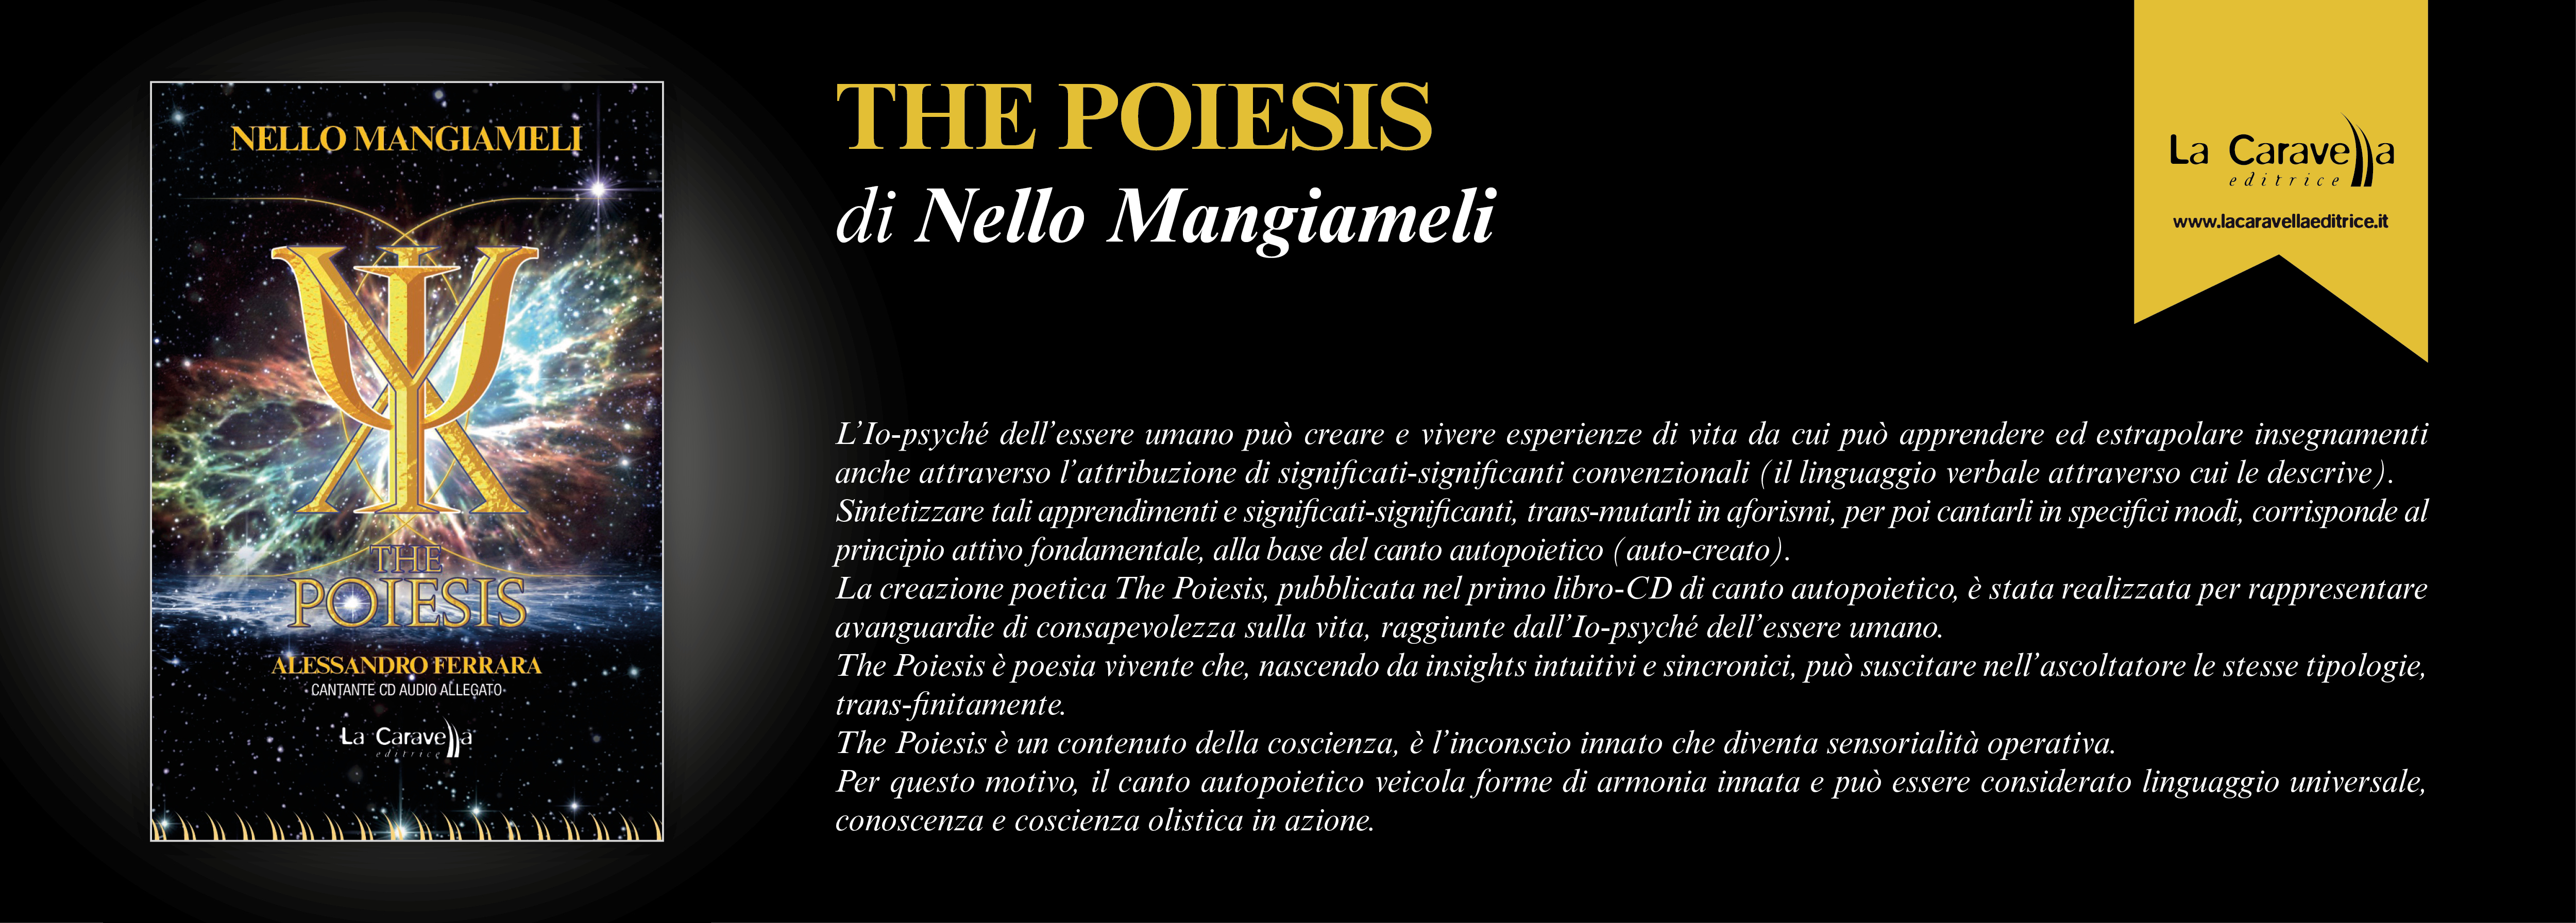 THE POIESIS